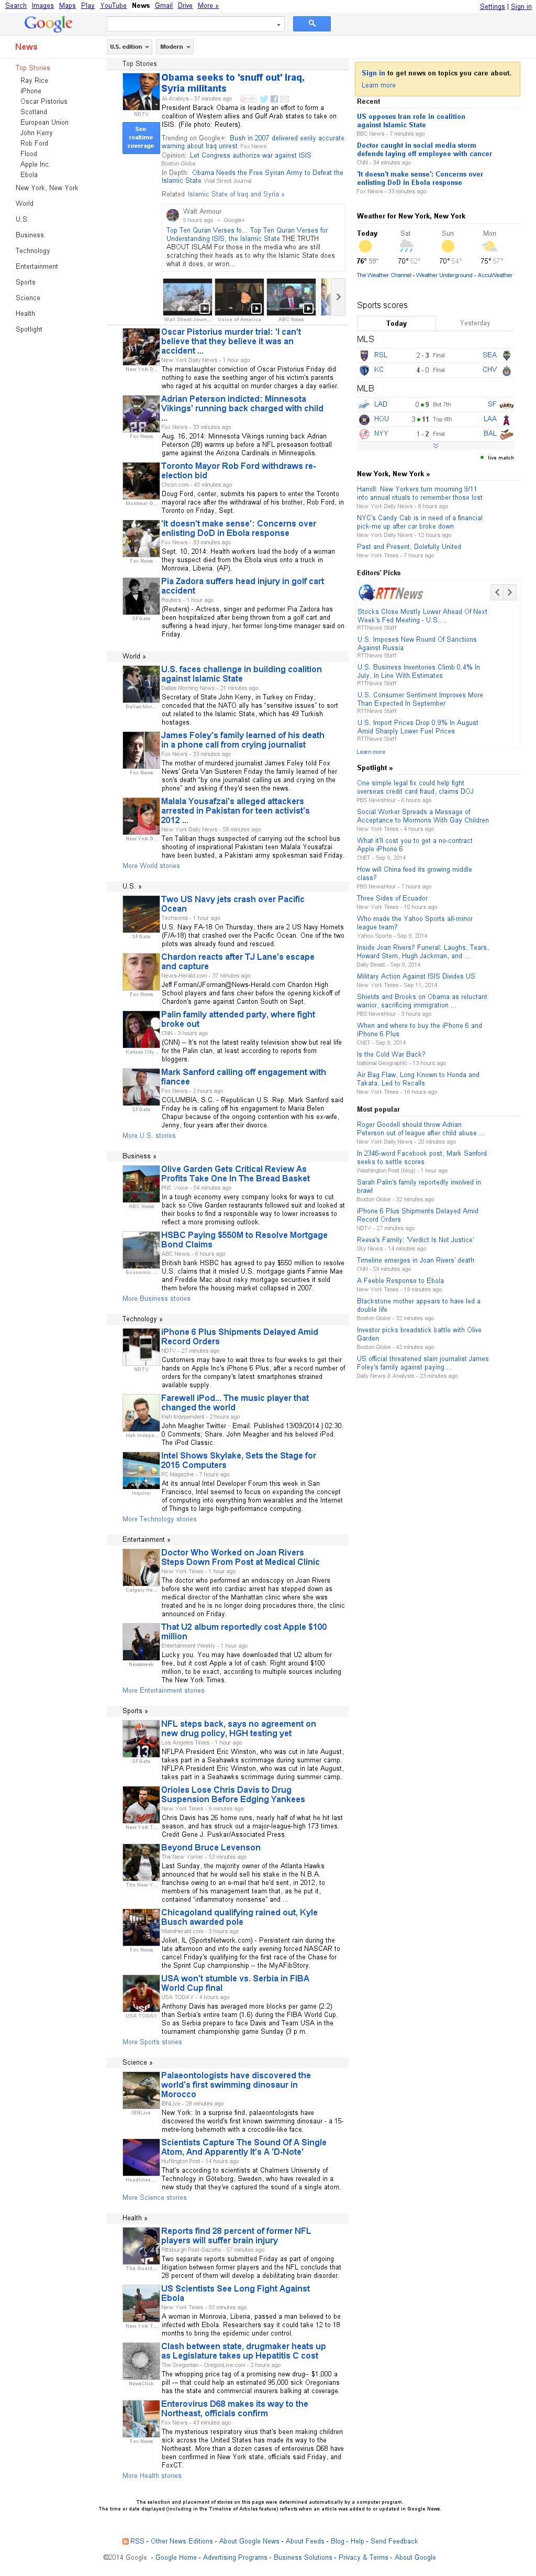 Google News at Saturday Sept. 13, 2014, 5:06 a.m. UTC